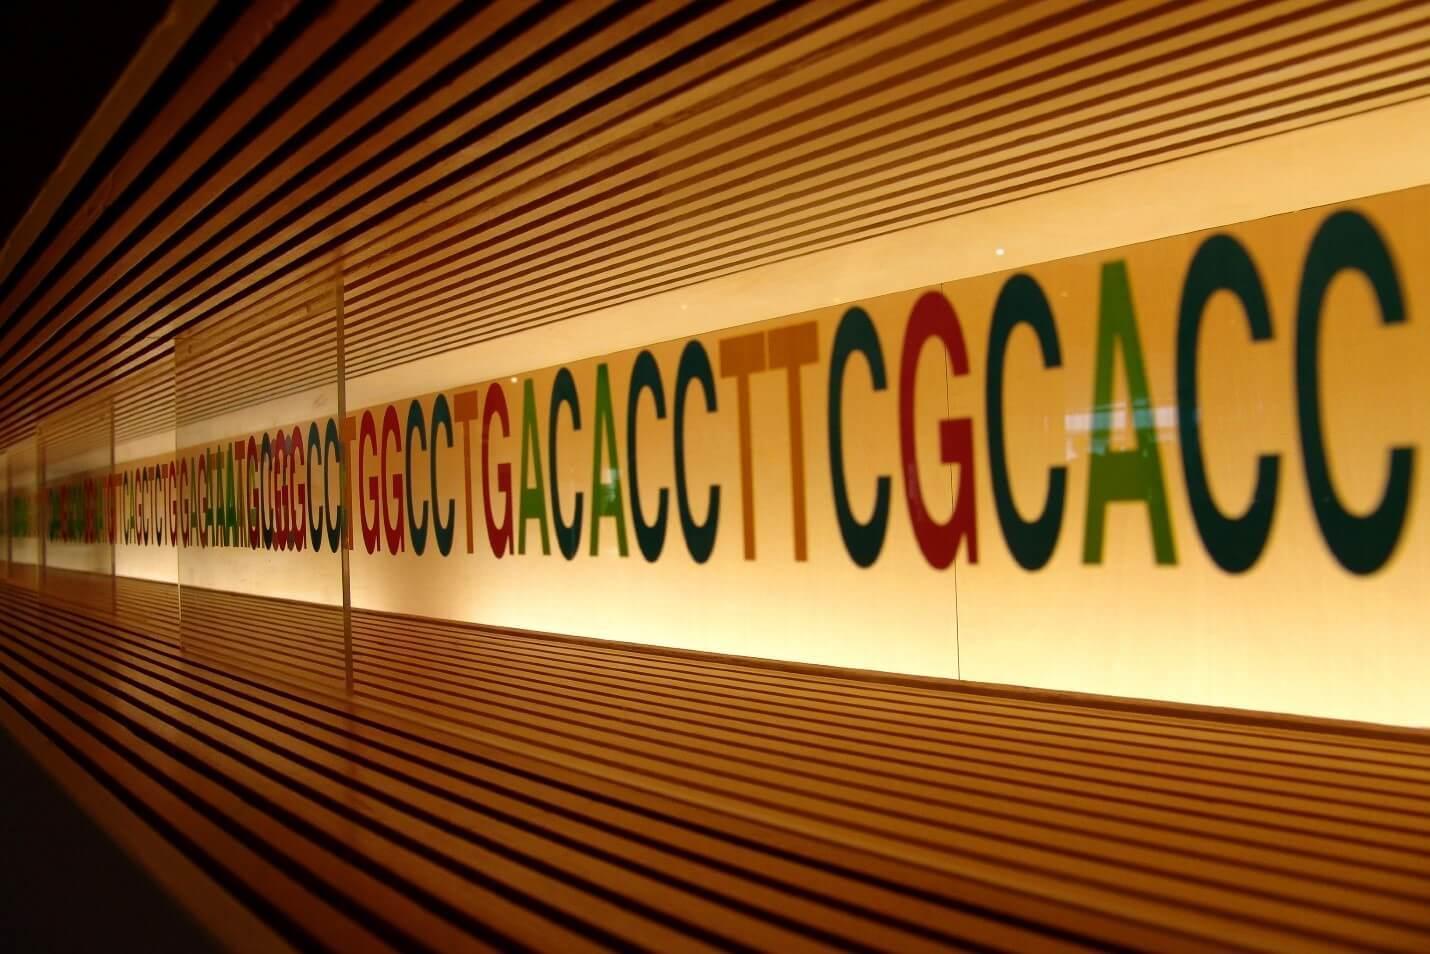 «Заложено природой»: Система хранения данных на основе ДНК - 1